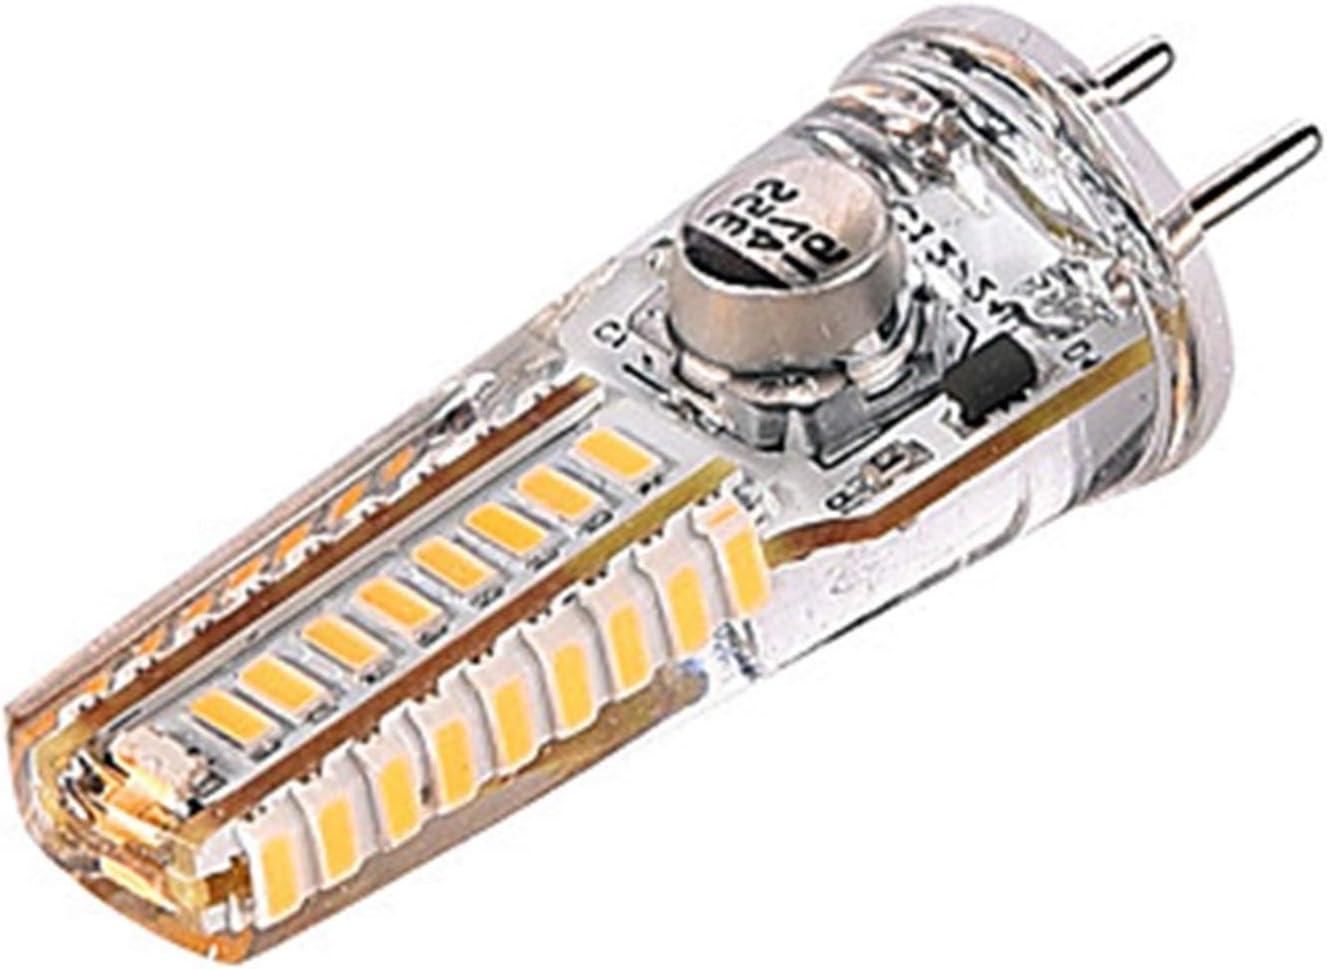 AC//DC 12-24 Volt Warm White 3000K GY6.35//G6.35 Bi-pin Base Welsun 24V GY6.35 LED Bulb 3Watt Equivalent to T4 JC Type 25W Incandescent Halogen Bulb 10-Pack